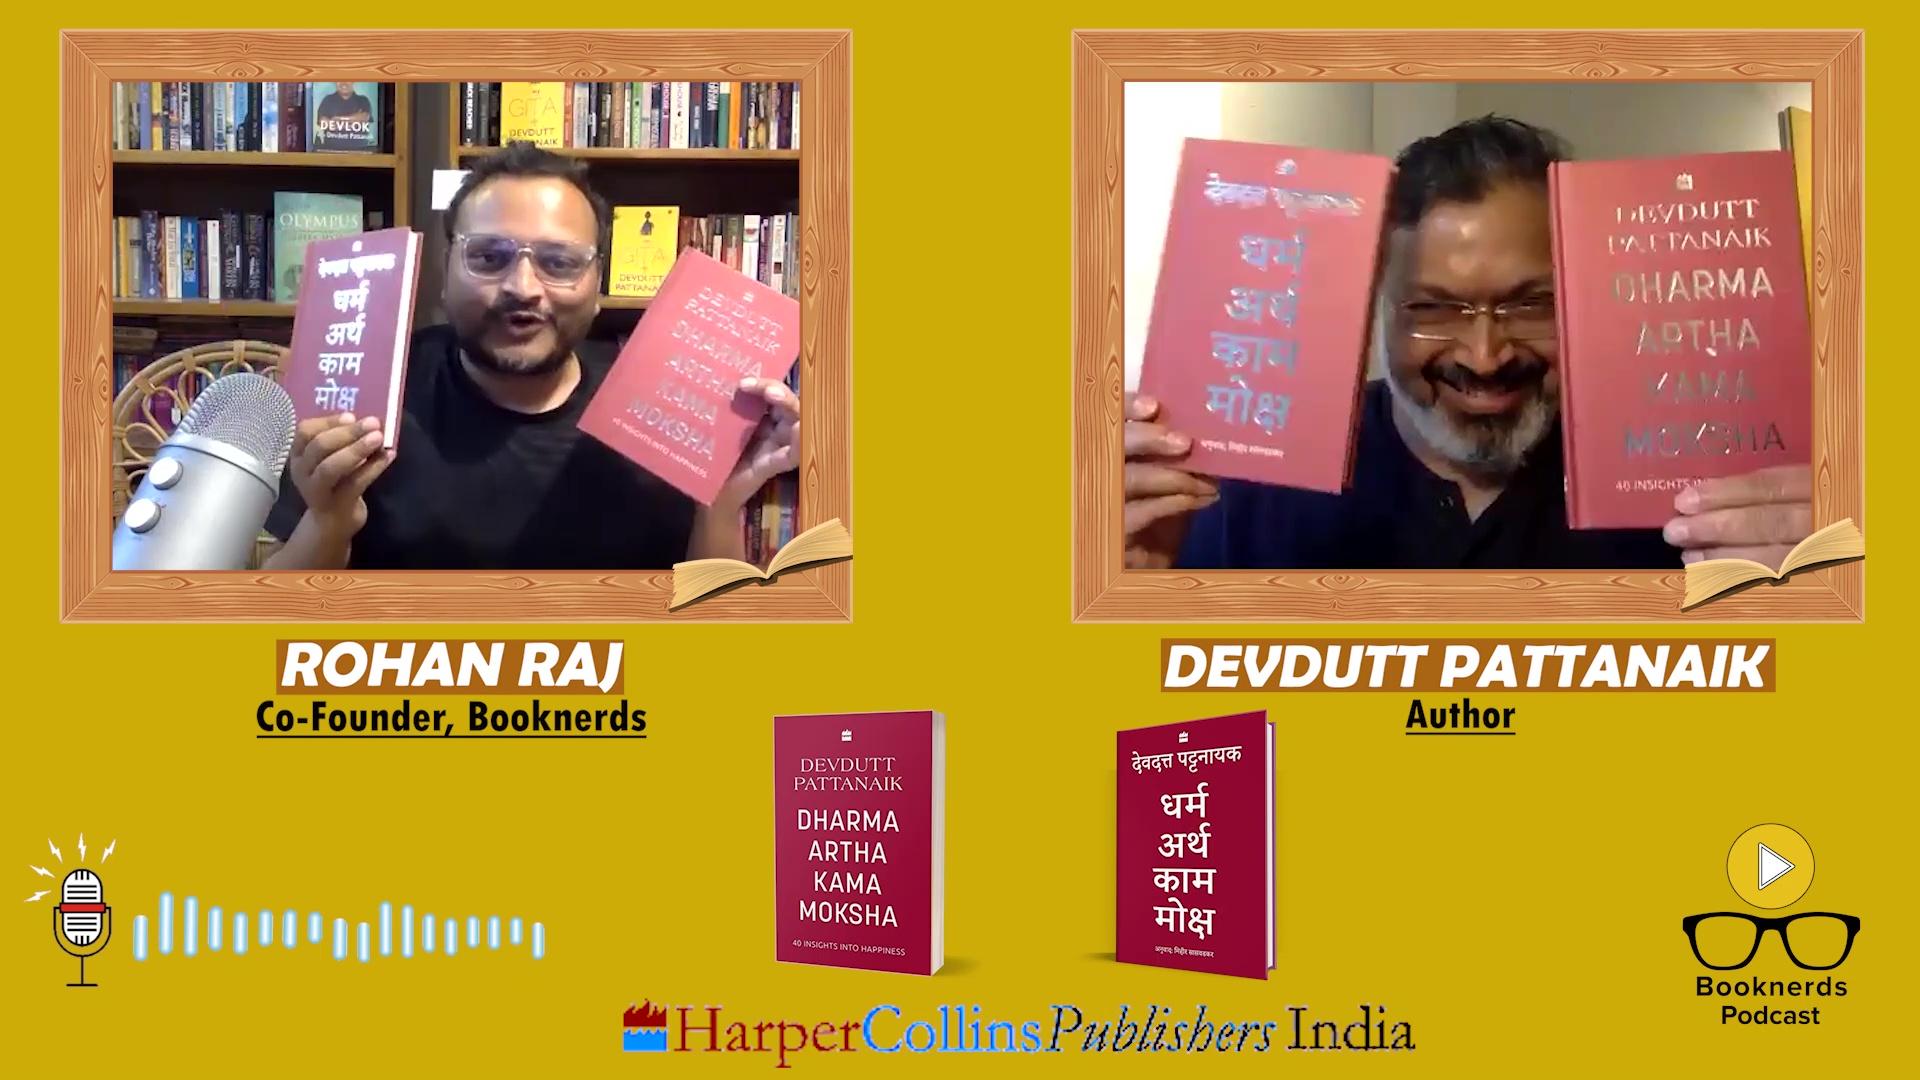 Booknerds Podcast | Devdutt Pattanaik | Dharma Artha Kama Moksha